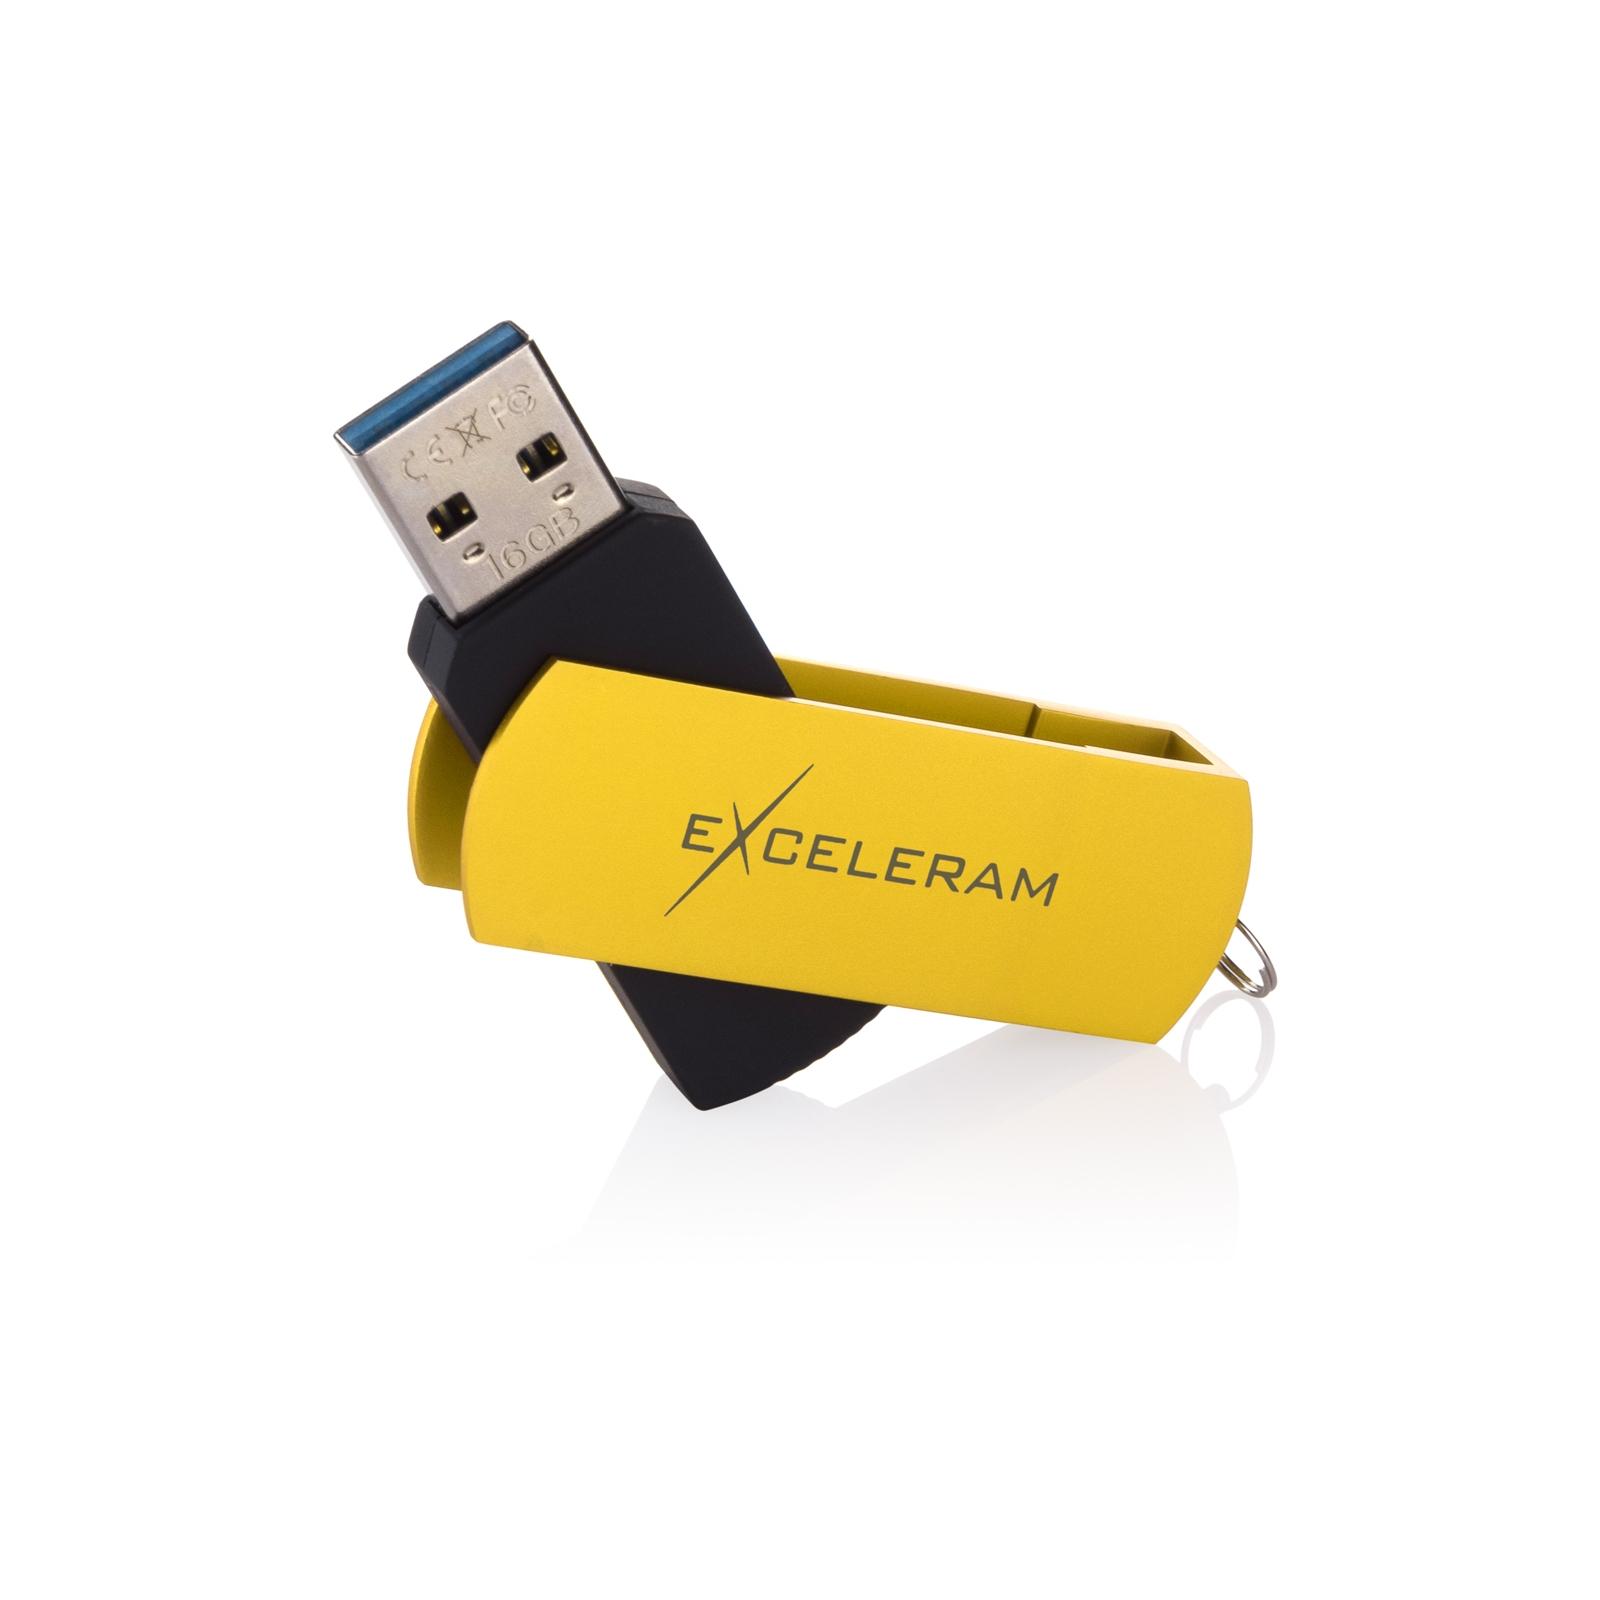 USB флеш накопитель eXceleram 16GB P2 Series Black/Black USB 3.1 Gen 1 (EXP2U3BB16) изображение 3